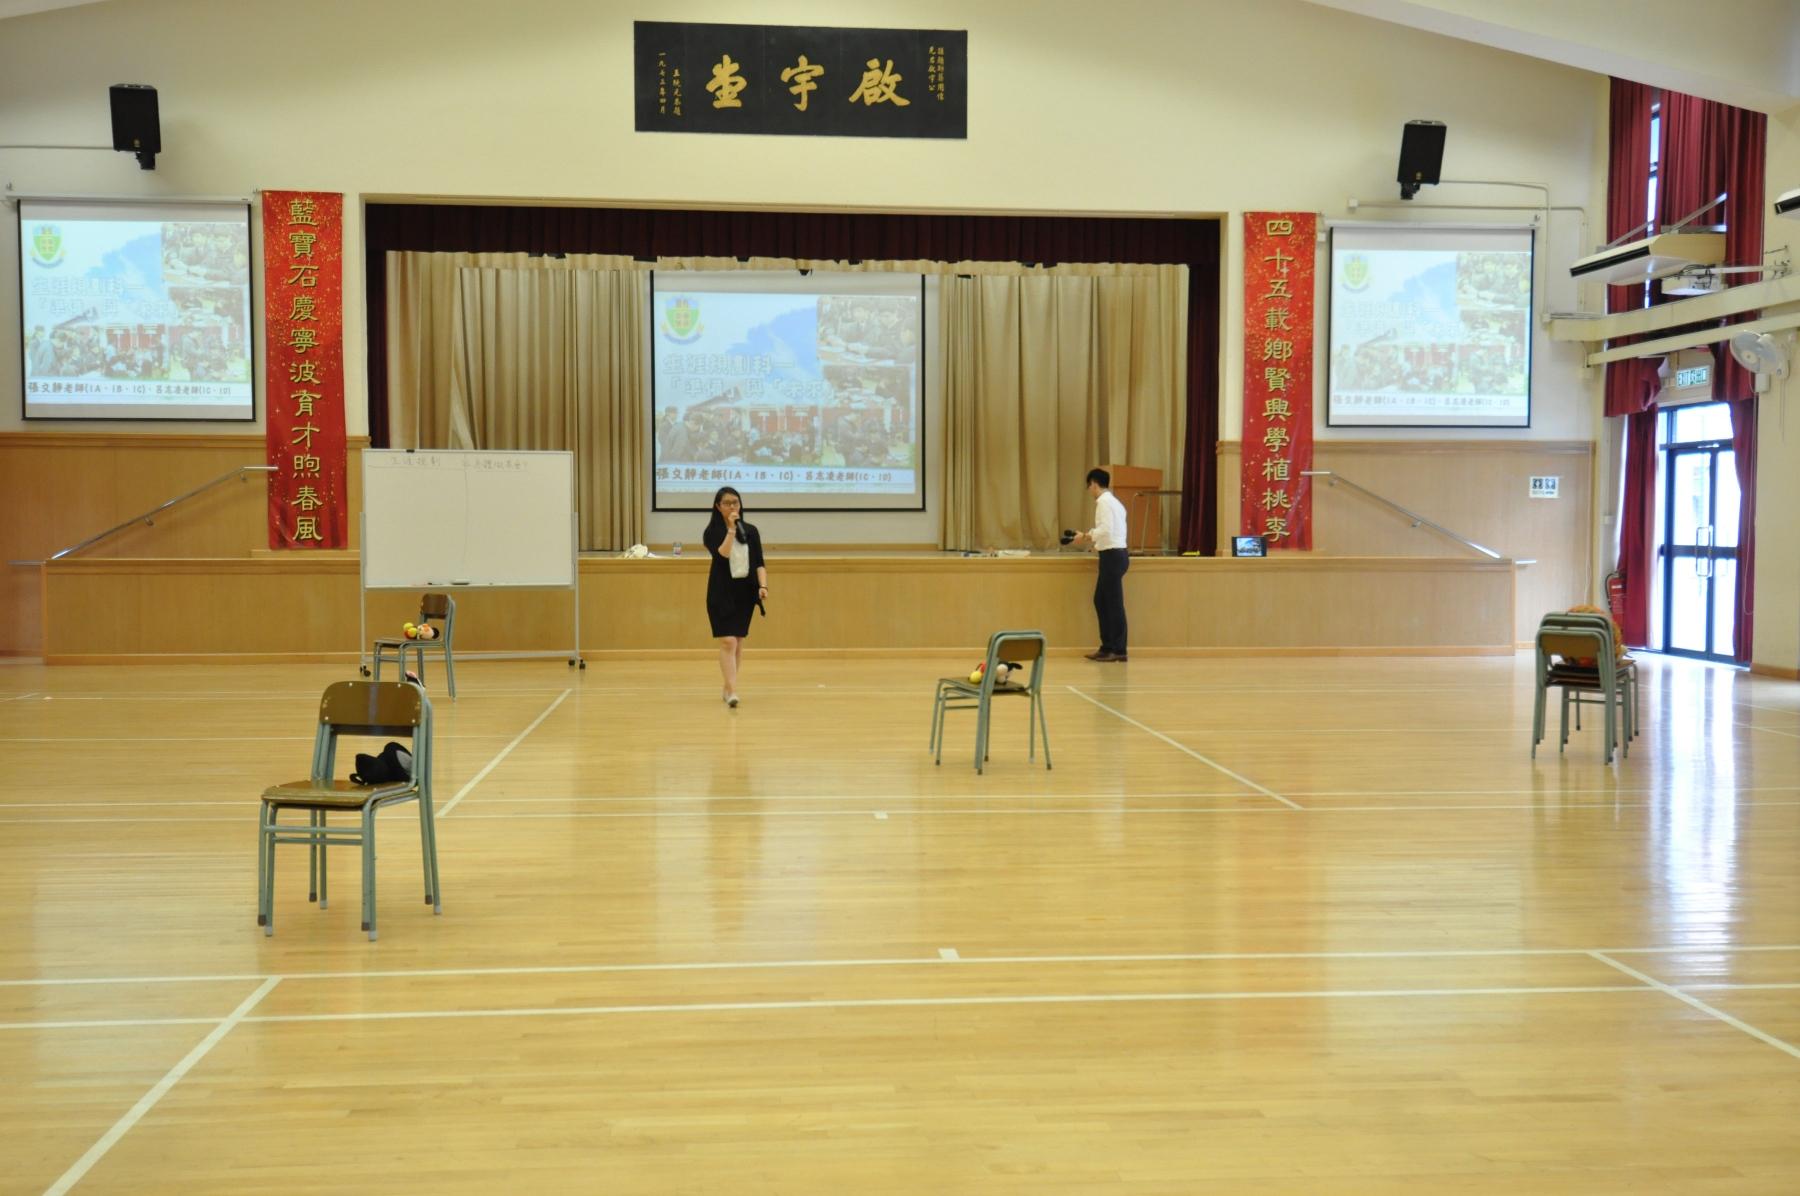 http://www.npc.edu.hk/sites/default/files/dsc_0191.jpg